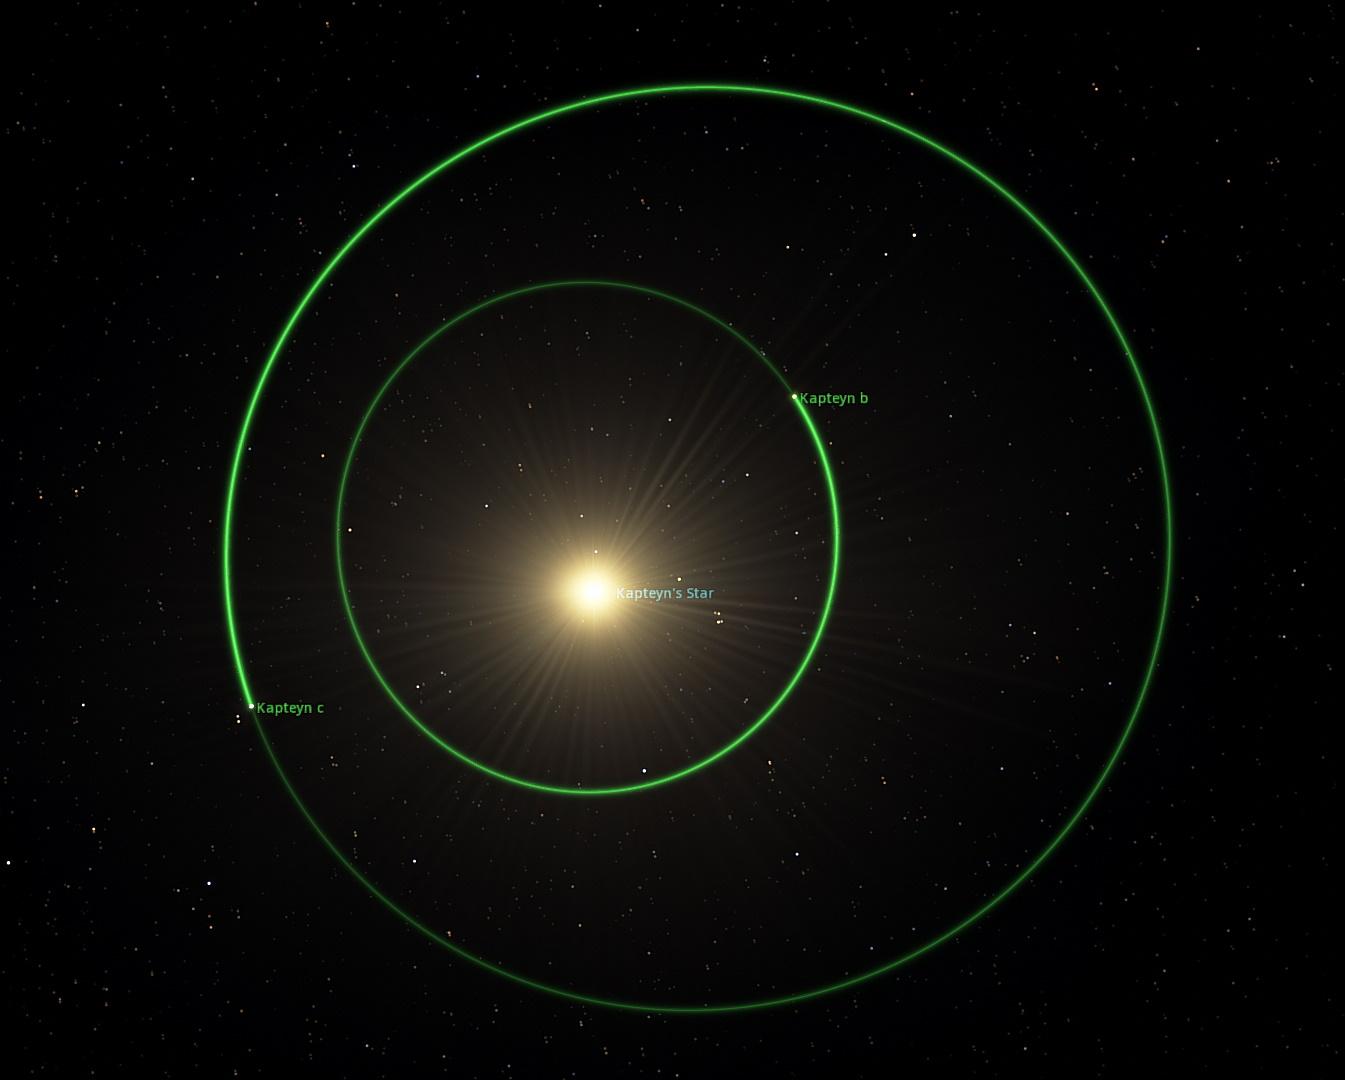 Kapteyn's Star